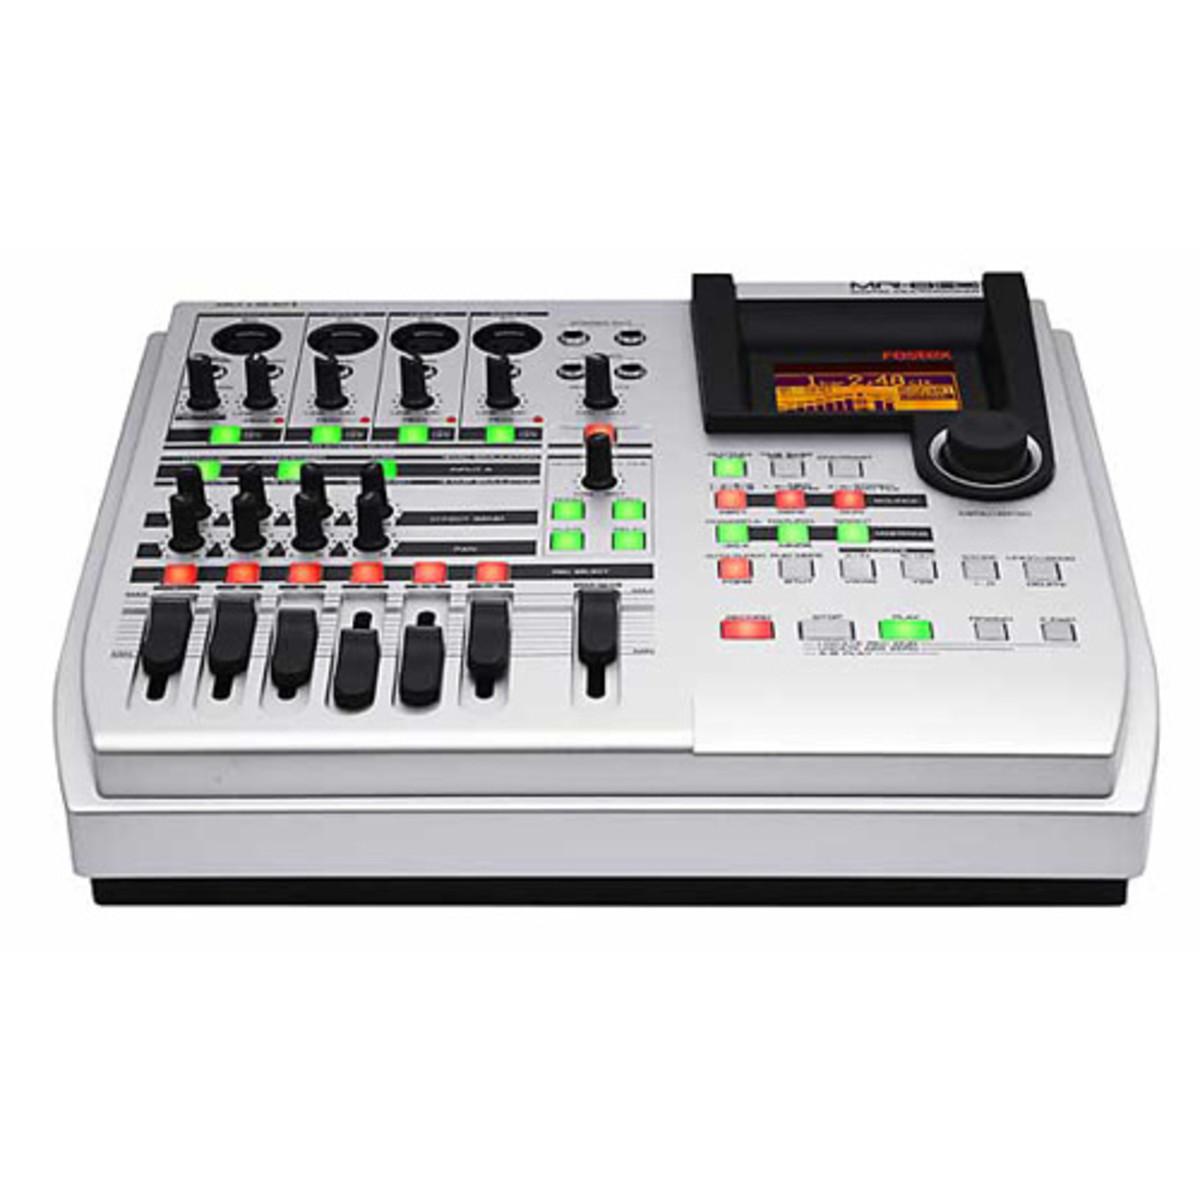 fostex mr8 hd 8 track digital recorder at. Black Bedroom Furniture Sets. Home Design Ideas